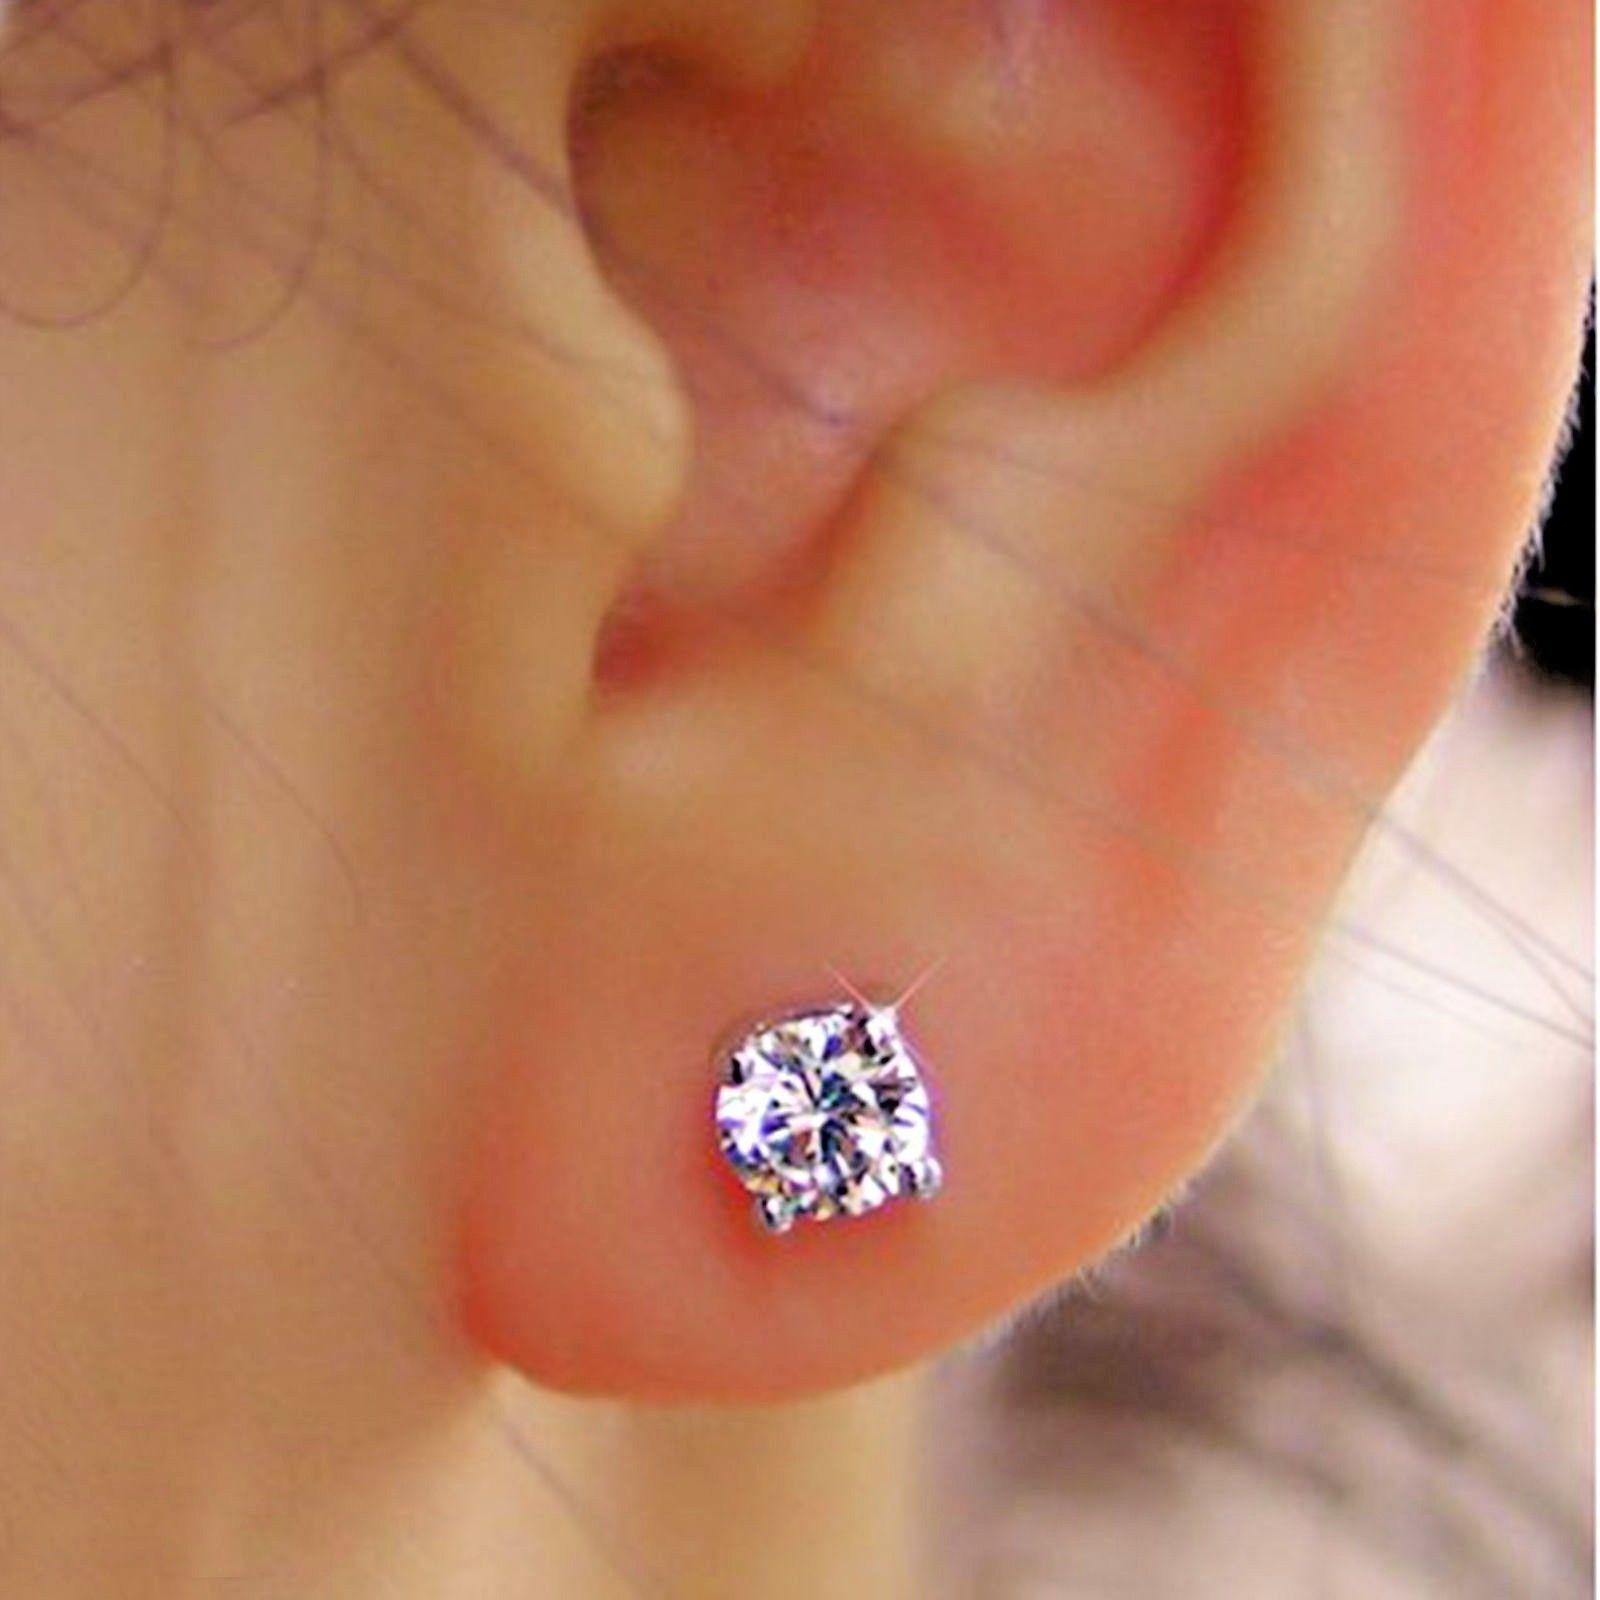 Real 0.50 Ct Diamond Solitaire Stud Earring Solid 950 Platinum Stud VS1 H-I Sale